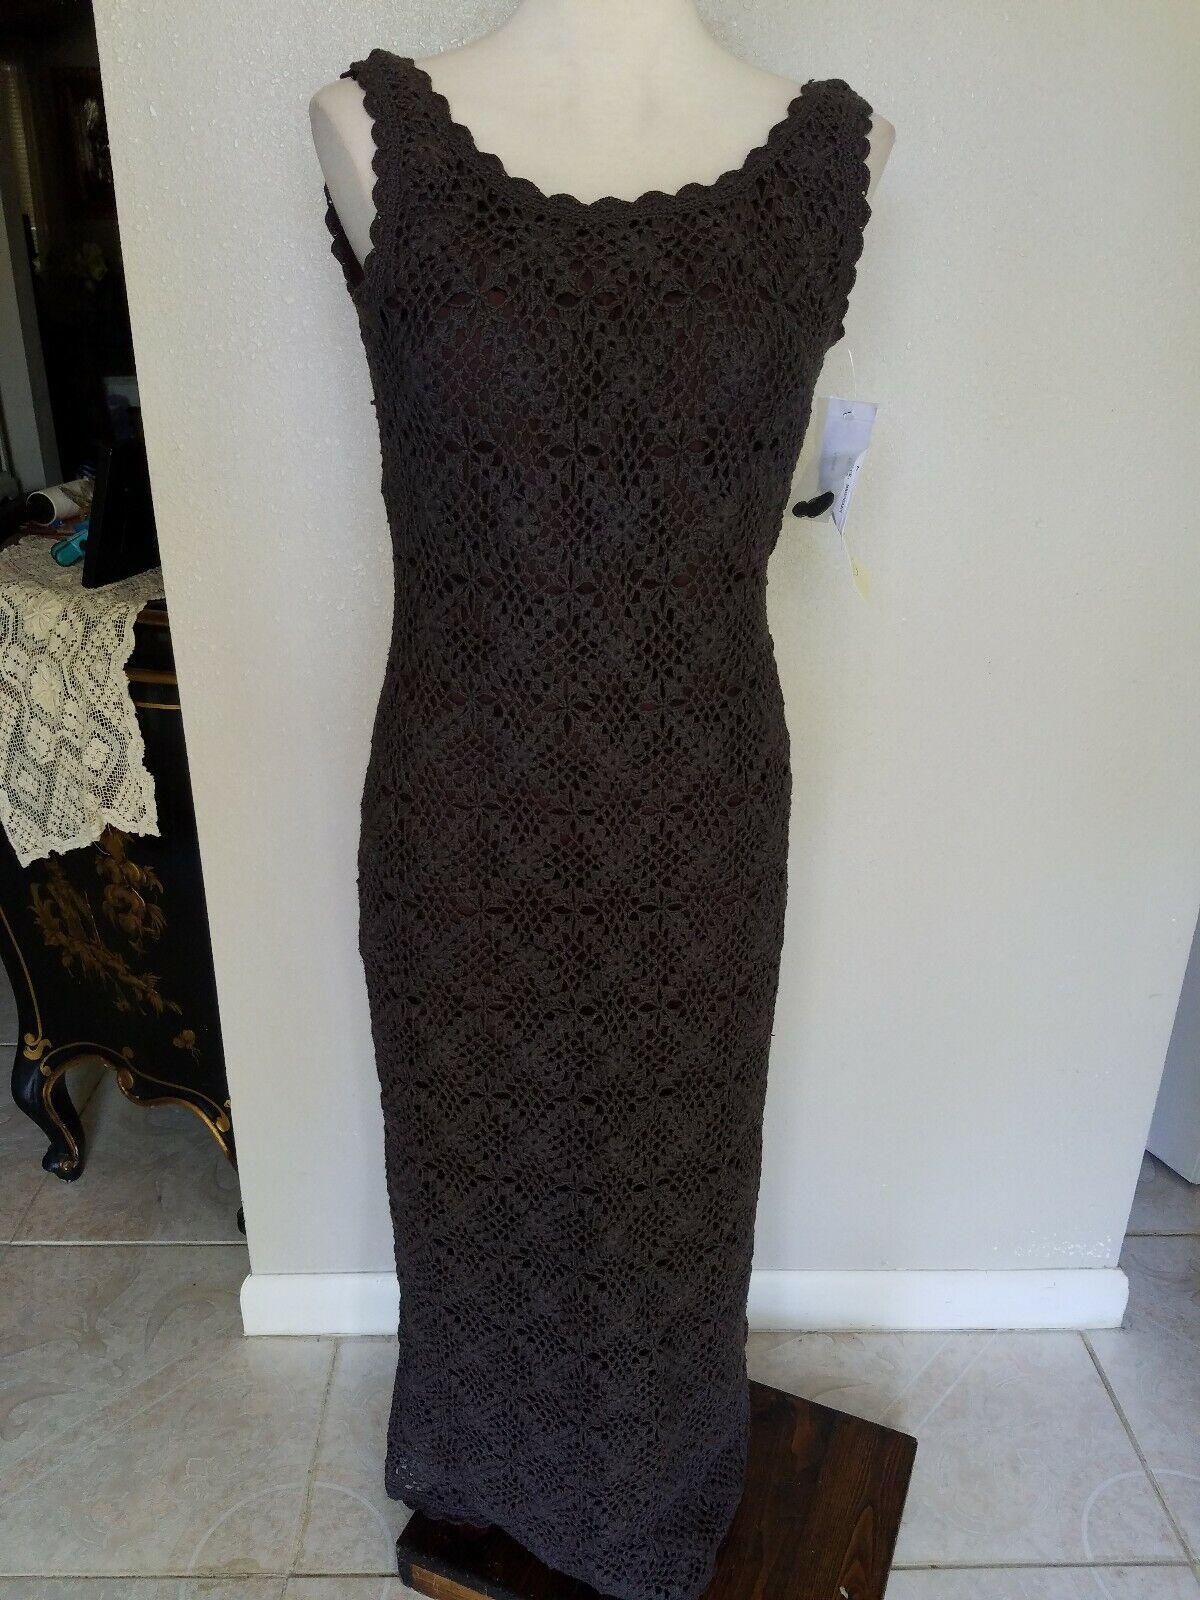 Marie St. Clair Long Crotched Mahogany Dress Größe 6